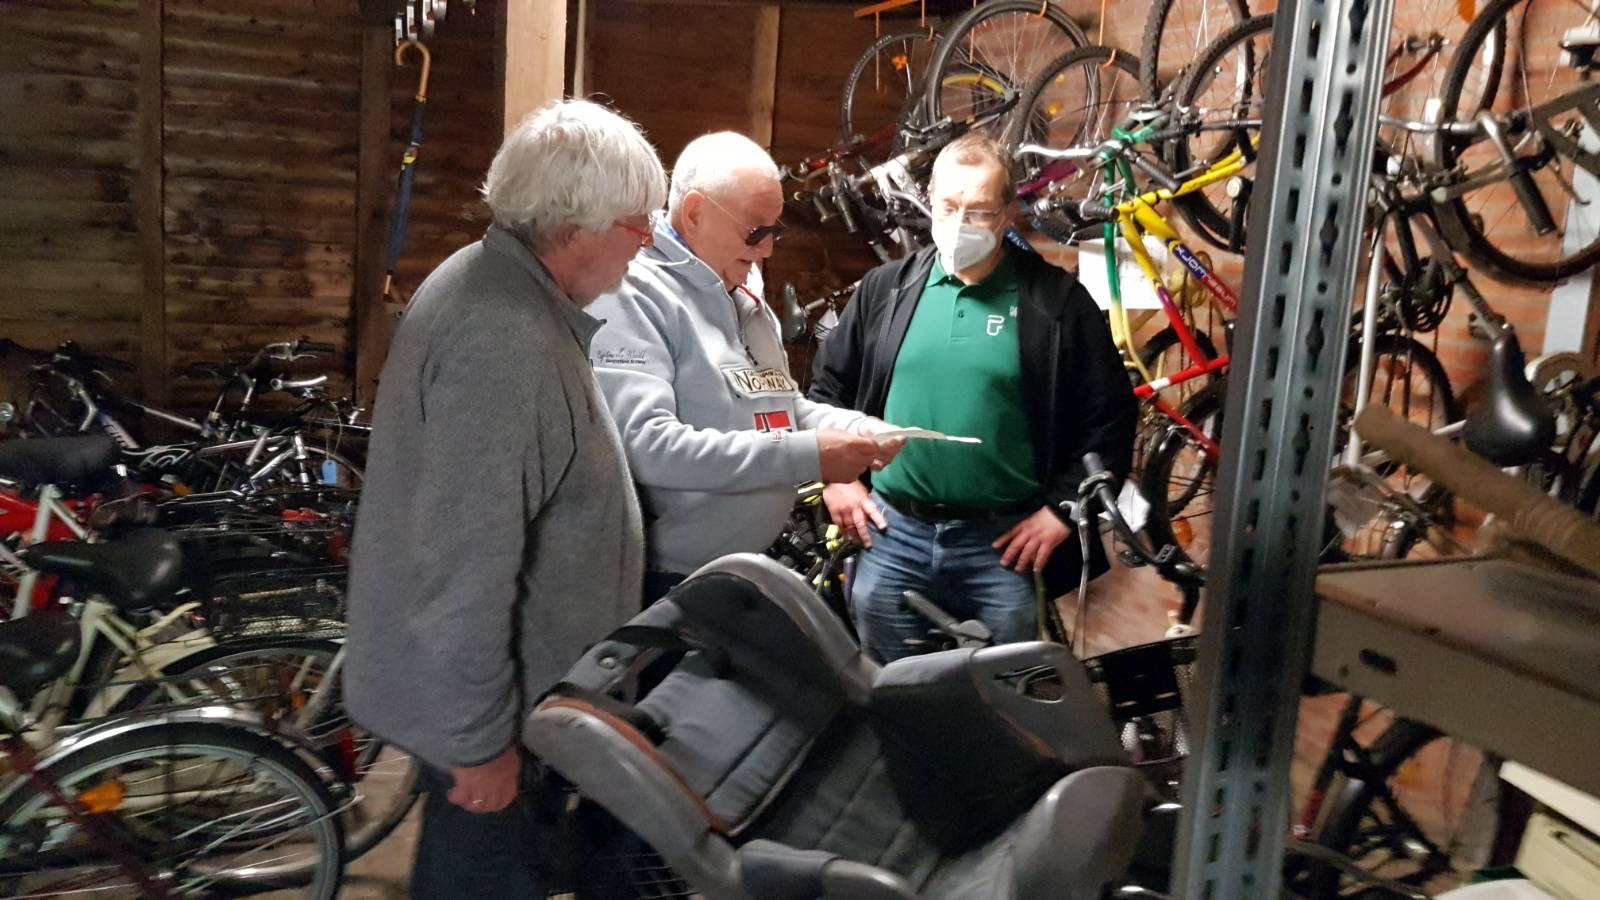 Lions unterstützen Fahrradwerkstatt an der Peter-Ustinov-Schule